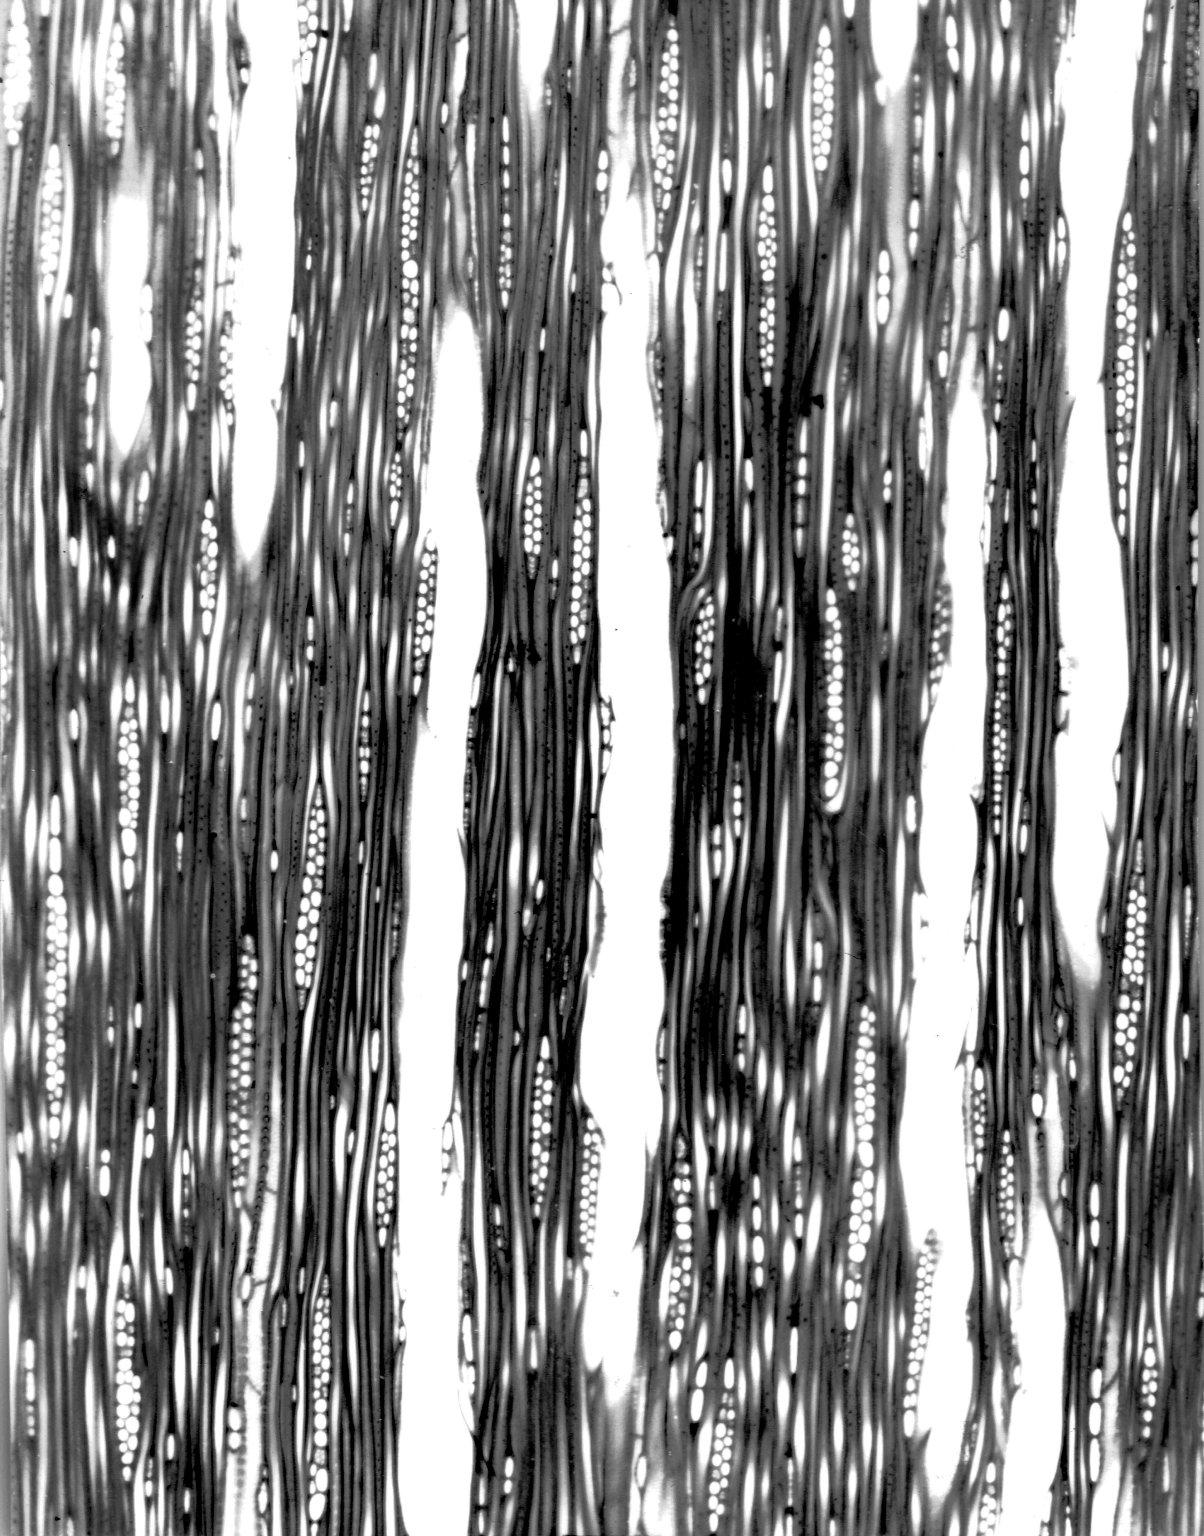 BUXACEAE Buxus macrocarpa